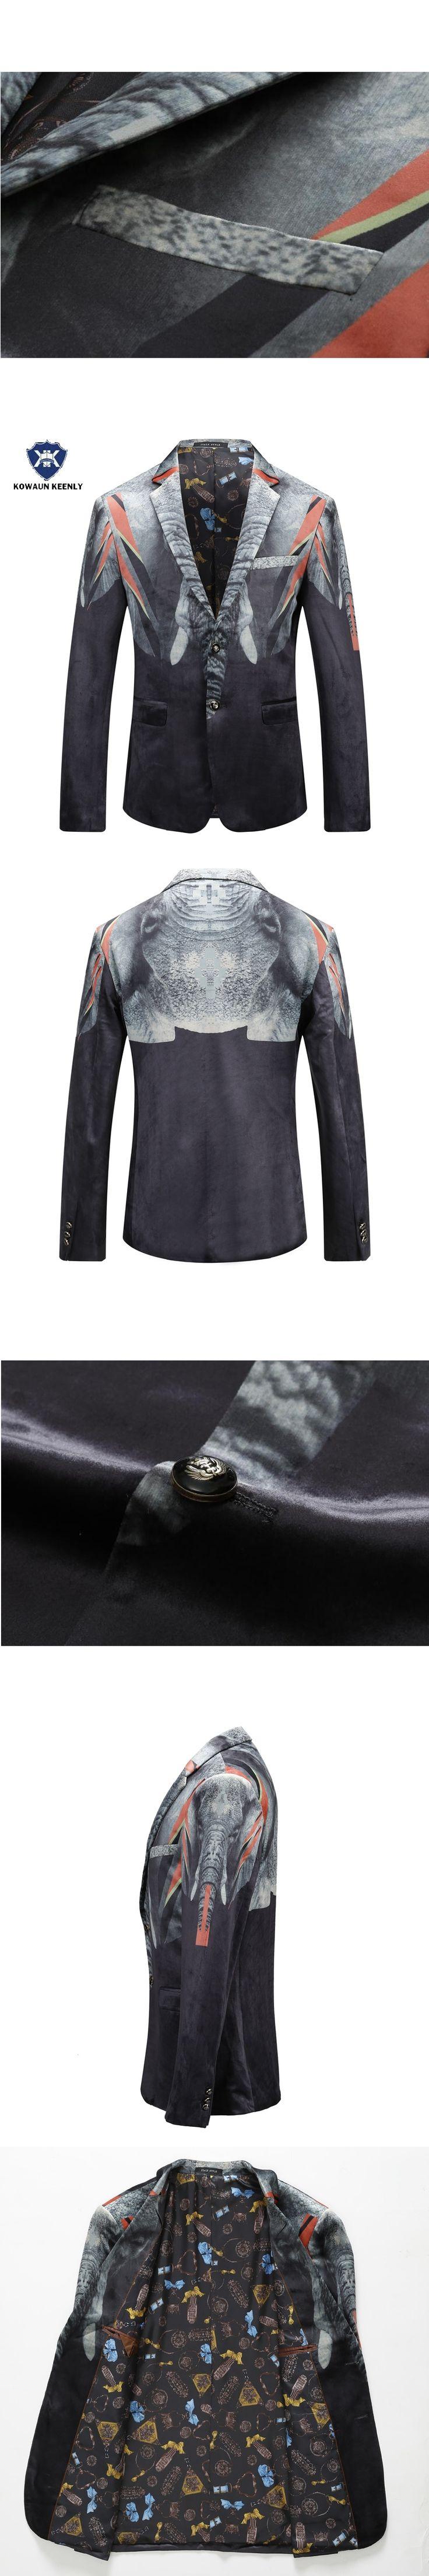 2017 Autumn Men Slim Fit  Casual Blazer For Men Printed Blazer Party Men Velvet Blazer Suit Jacket Prom Blazer For Men